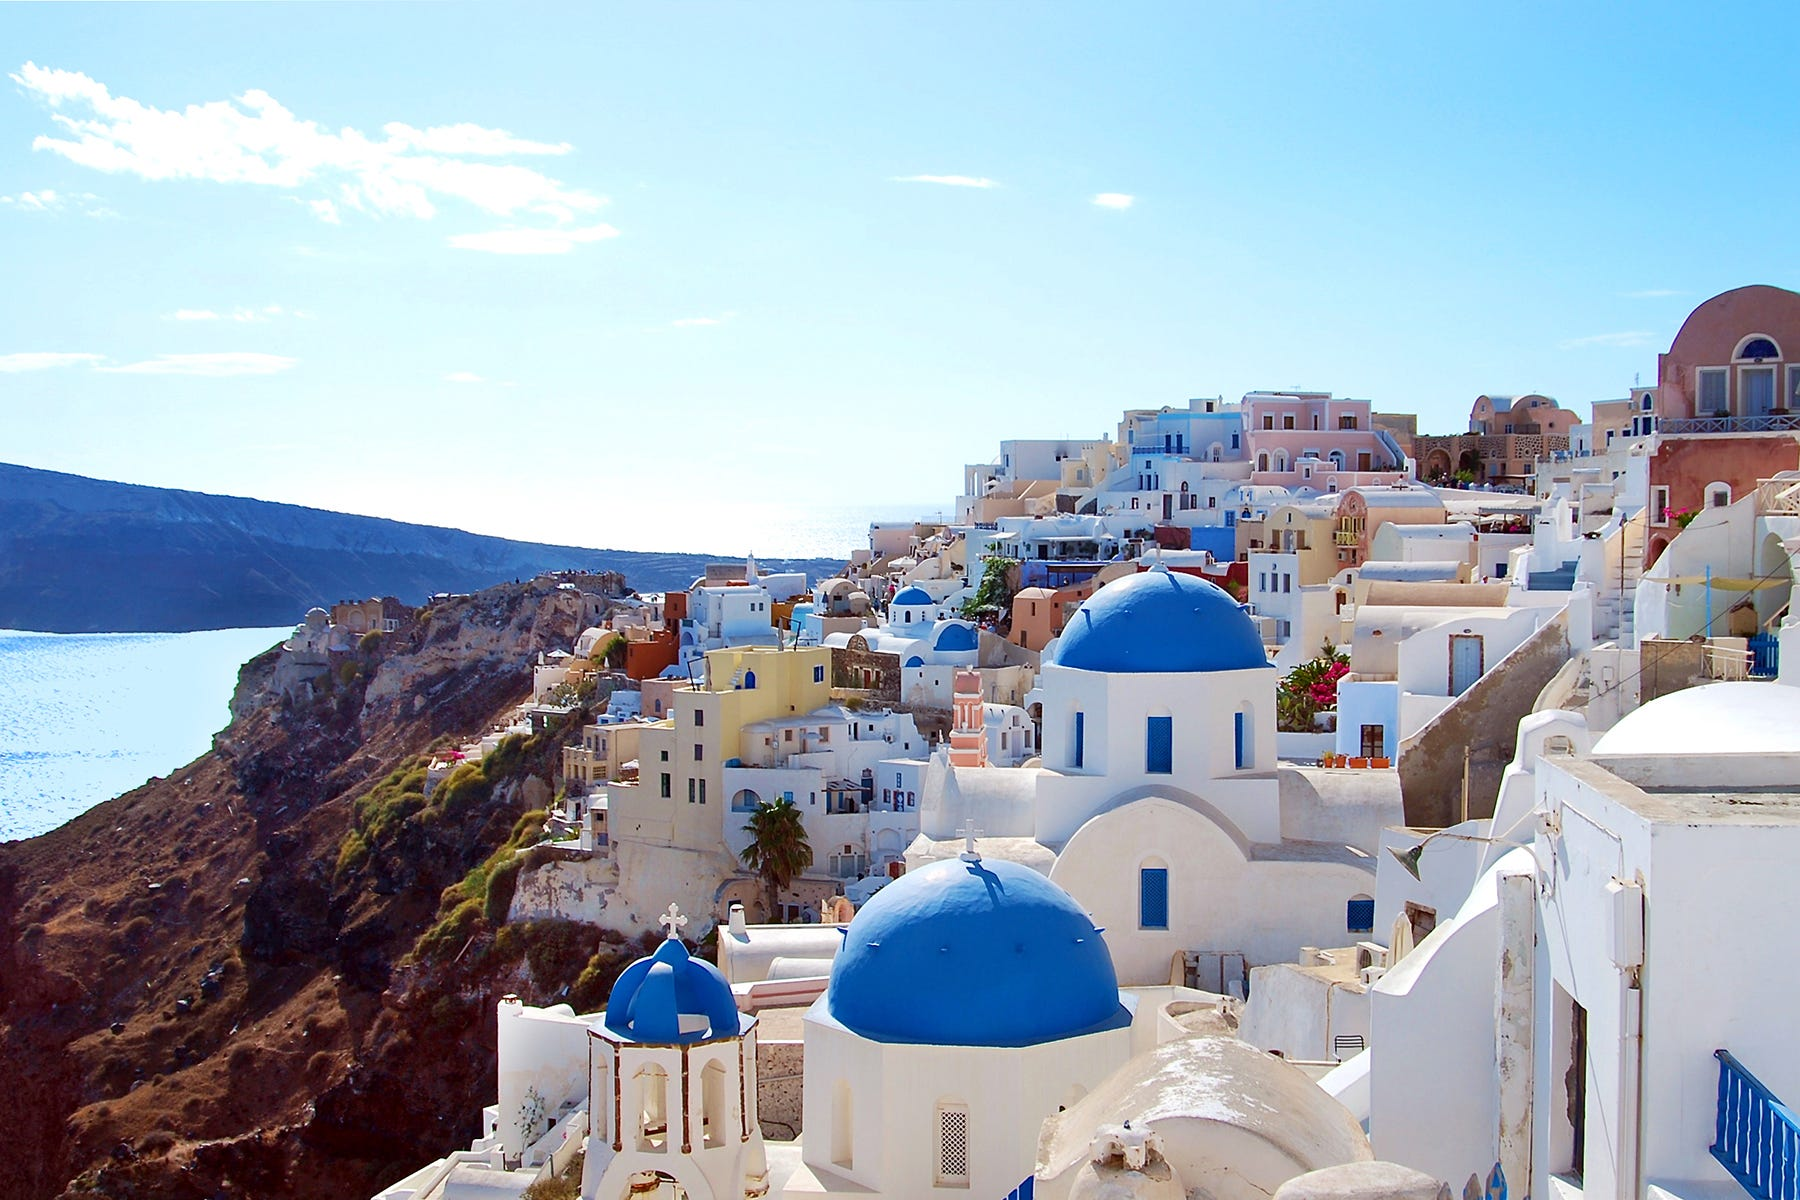 Rick Steves: Discovering the wonders of Santorini